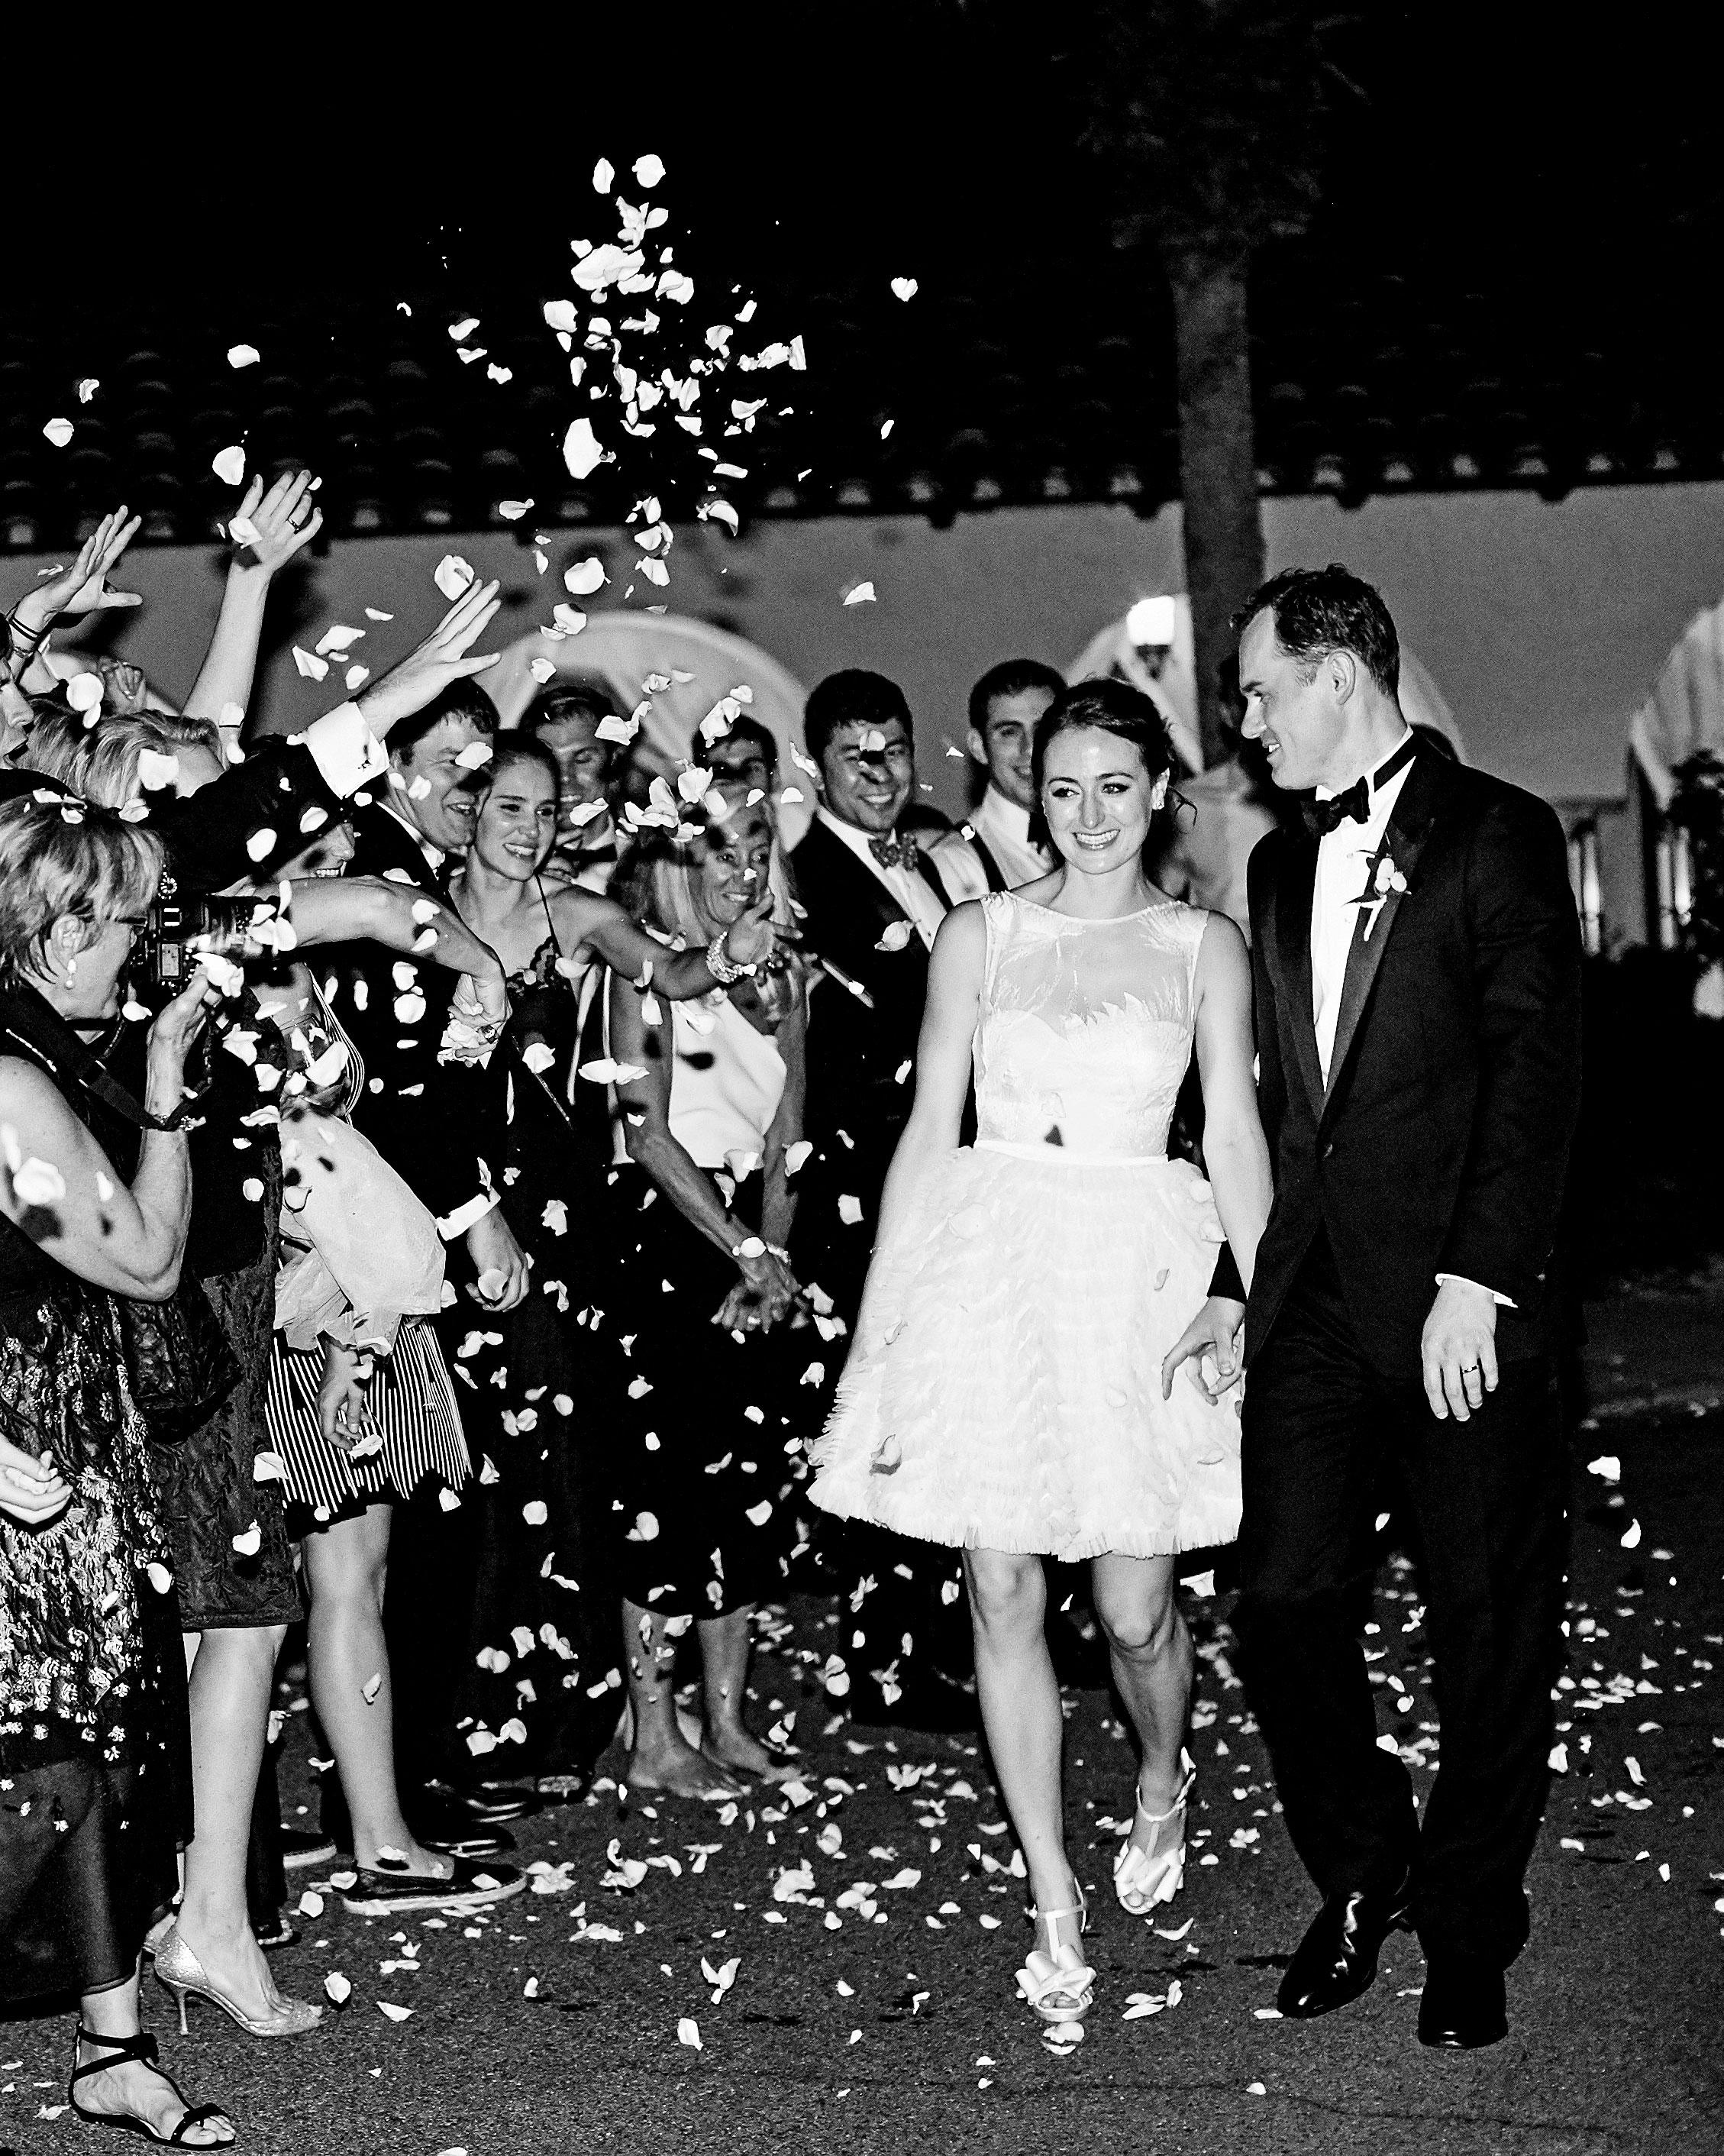 nancy-nathan-wedding-send-off-1458-6141569-0816.jpg